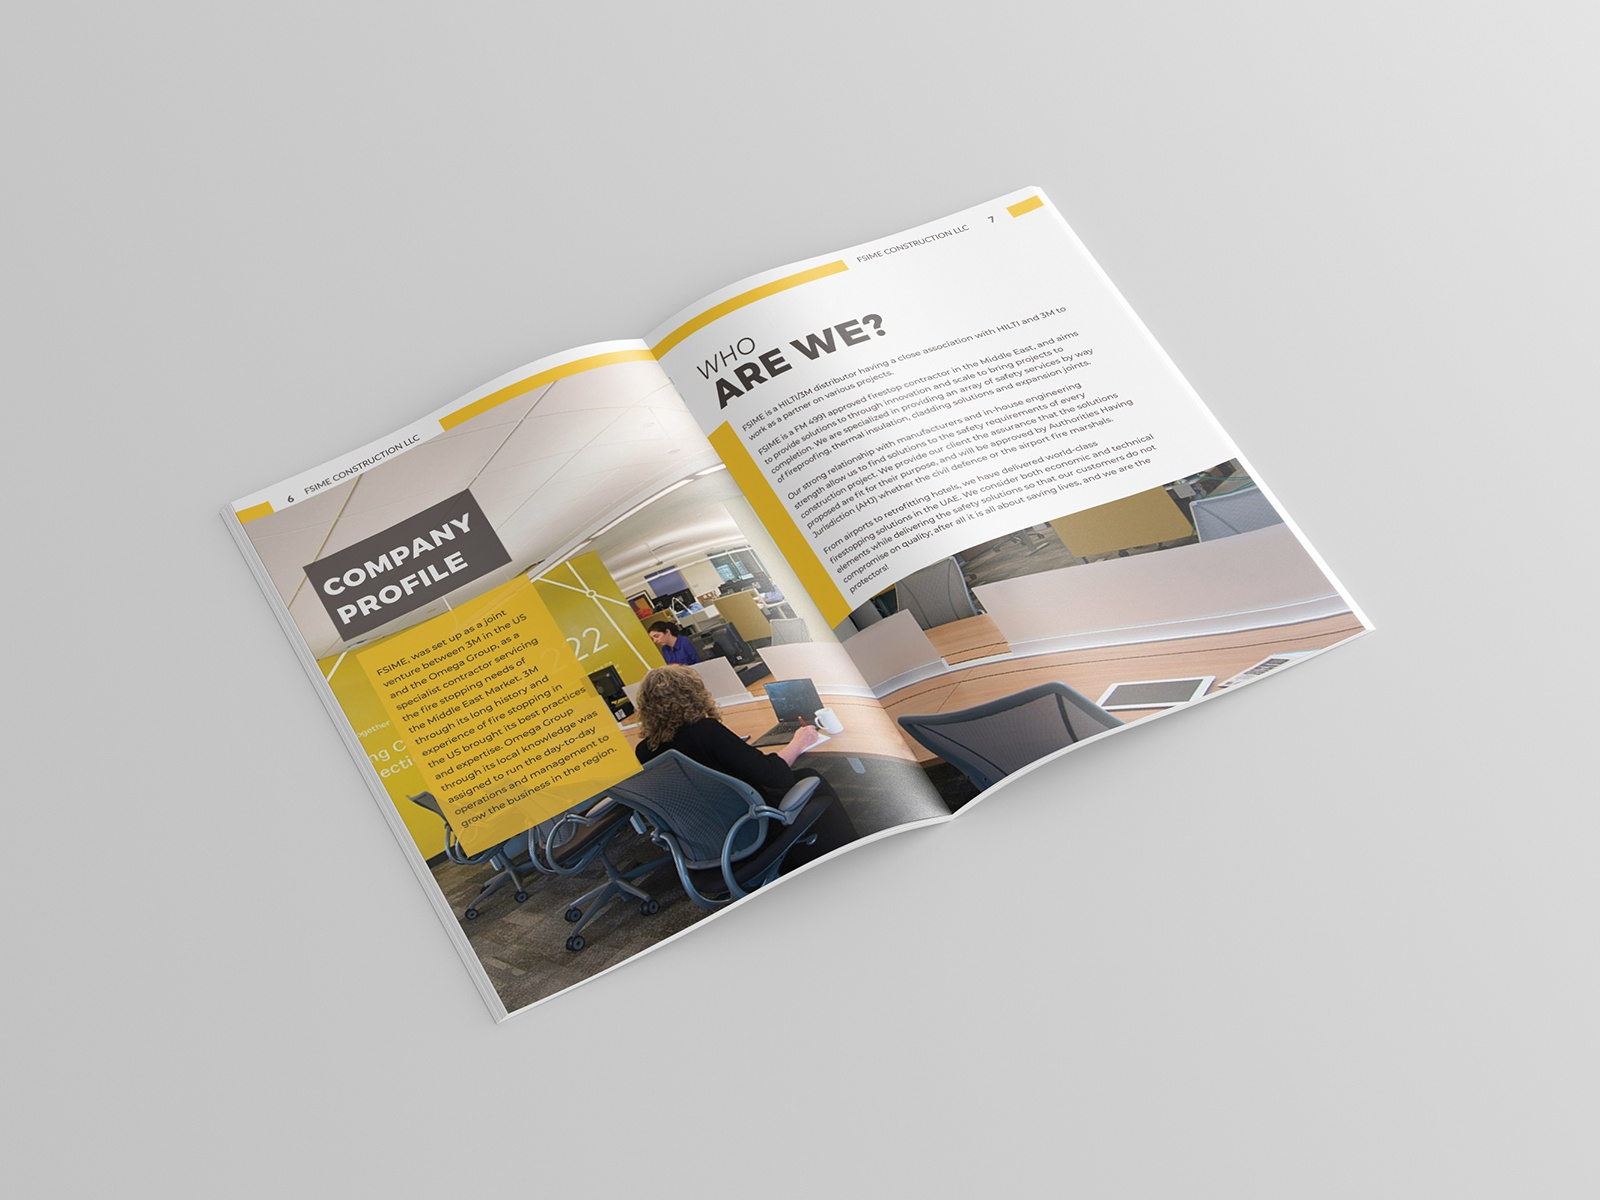 Company Profile Brochure Design by ProBrochureLand on Dribbble